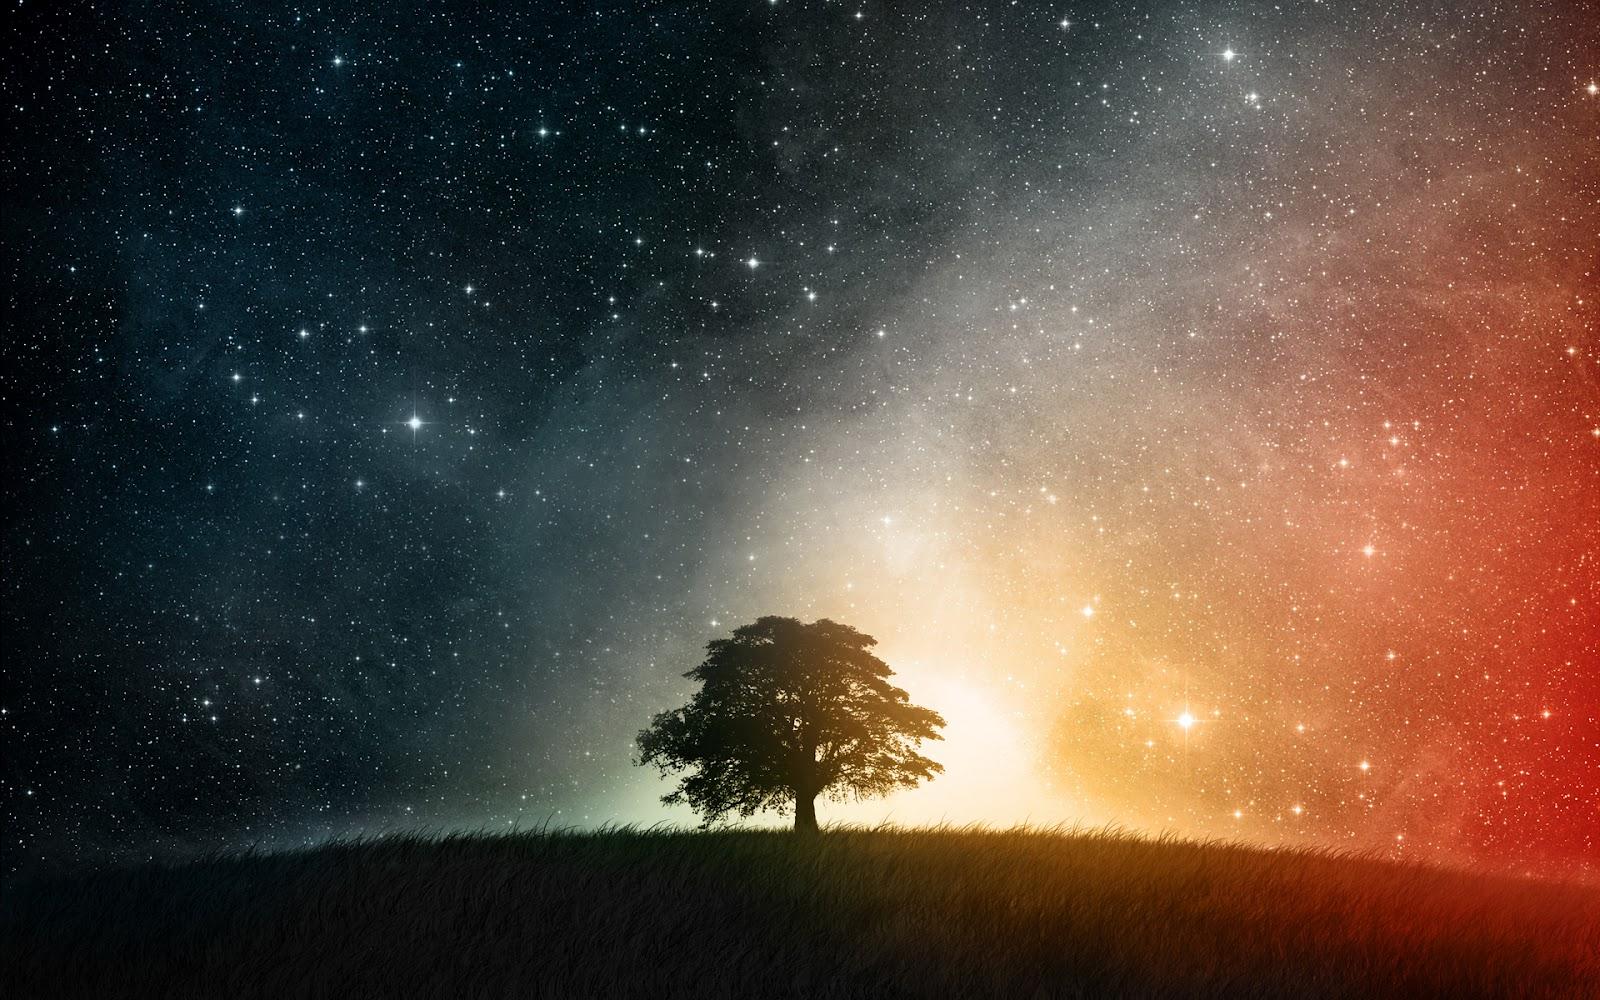 http://2.bp.blogspot.com/-l-Mi81rKMxE/UDyCVPjJhcI/AAAAAAAAAC0/H8piysXrNBE/s1600/Night-Sky.jpg